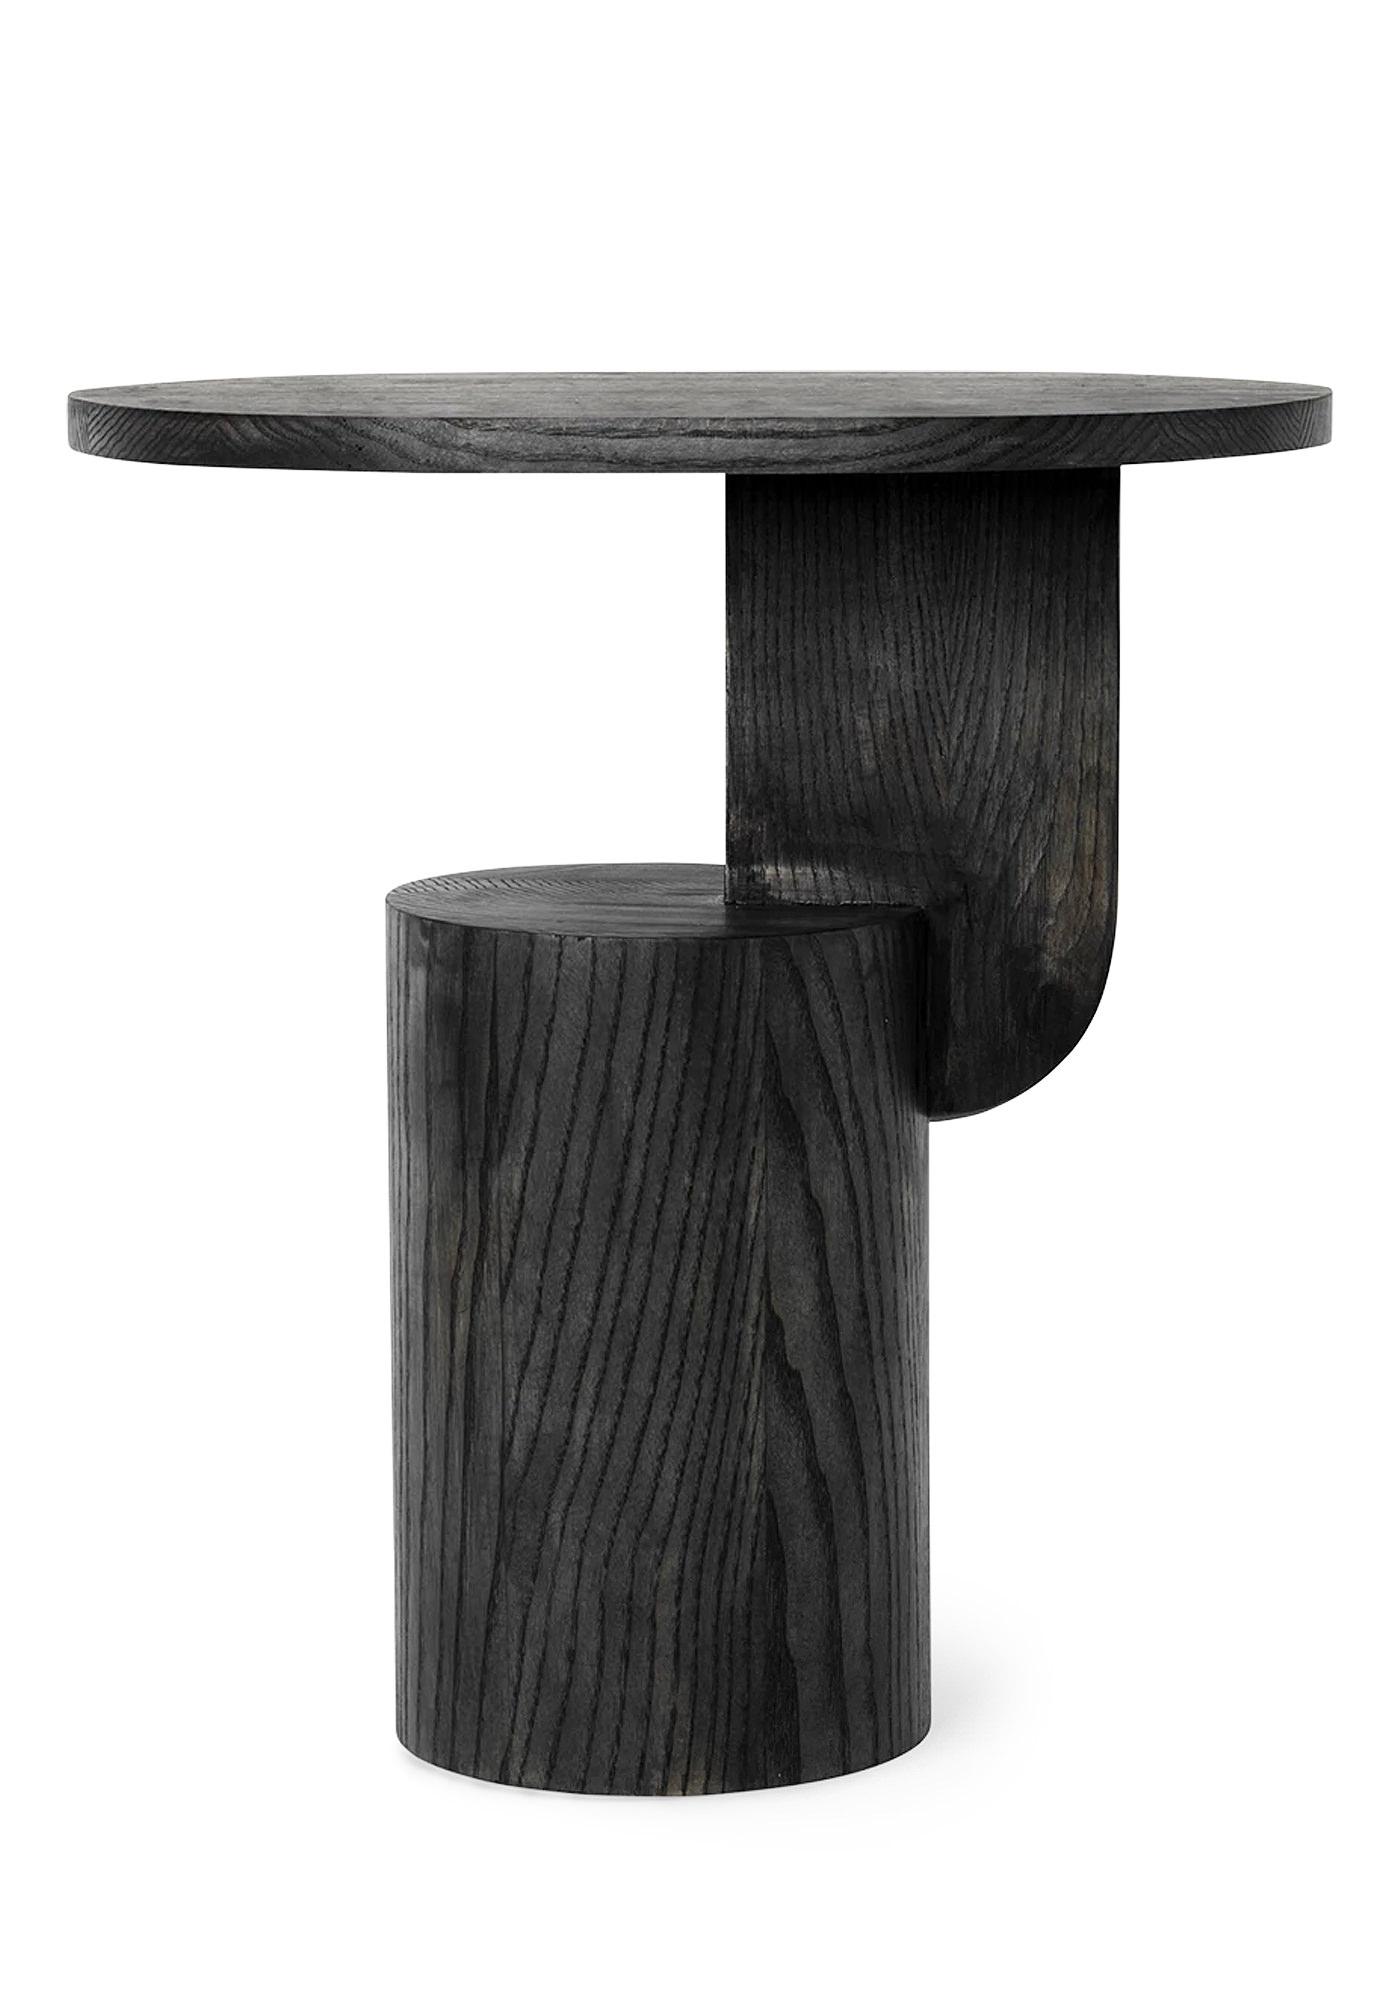 Ferm Living Collection AW19 Table Bois Noir